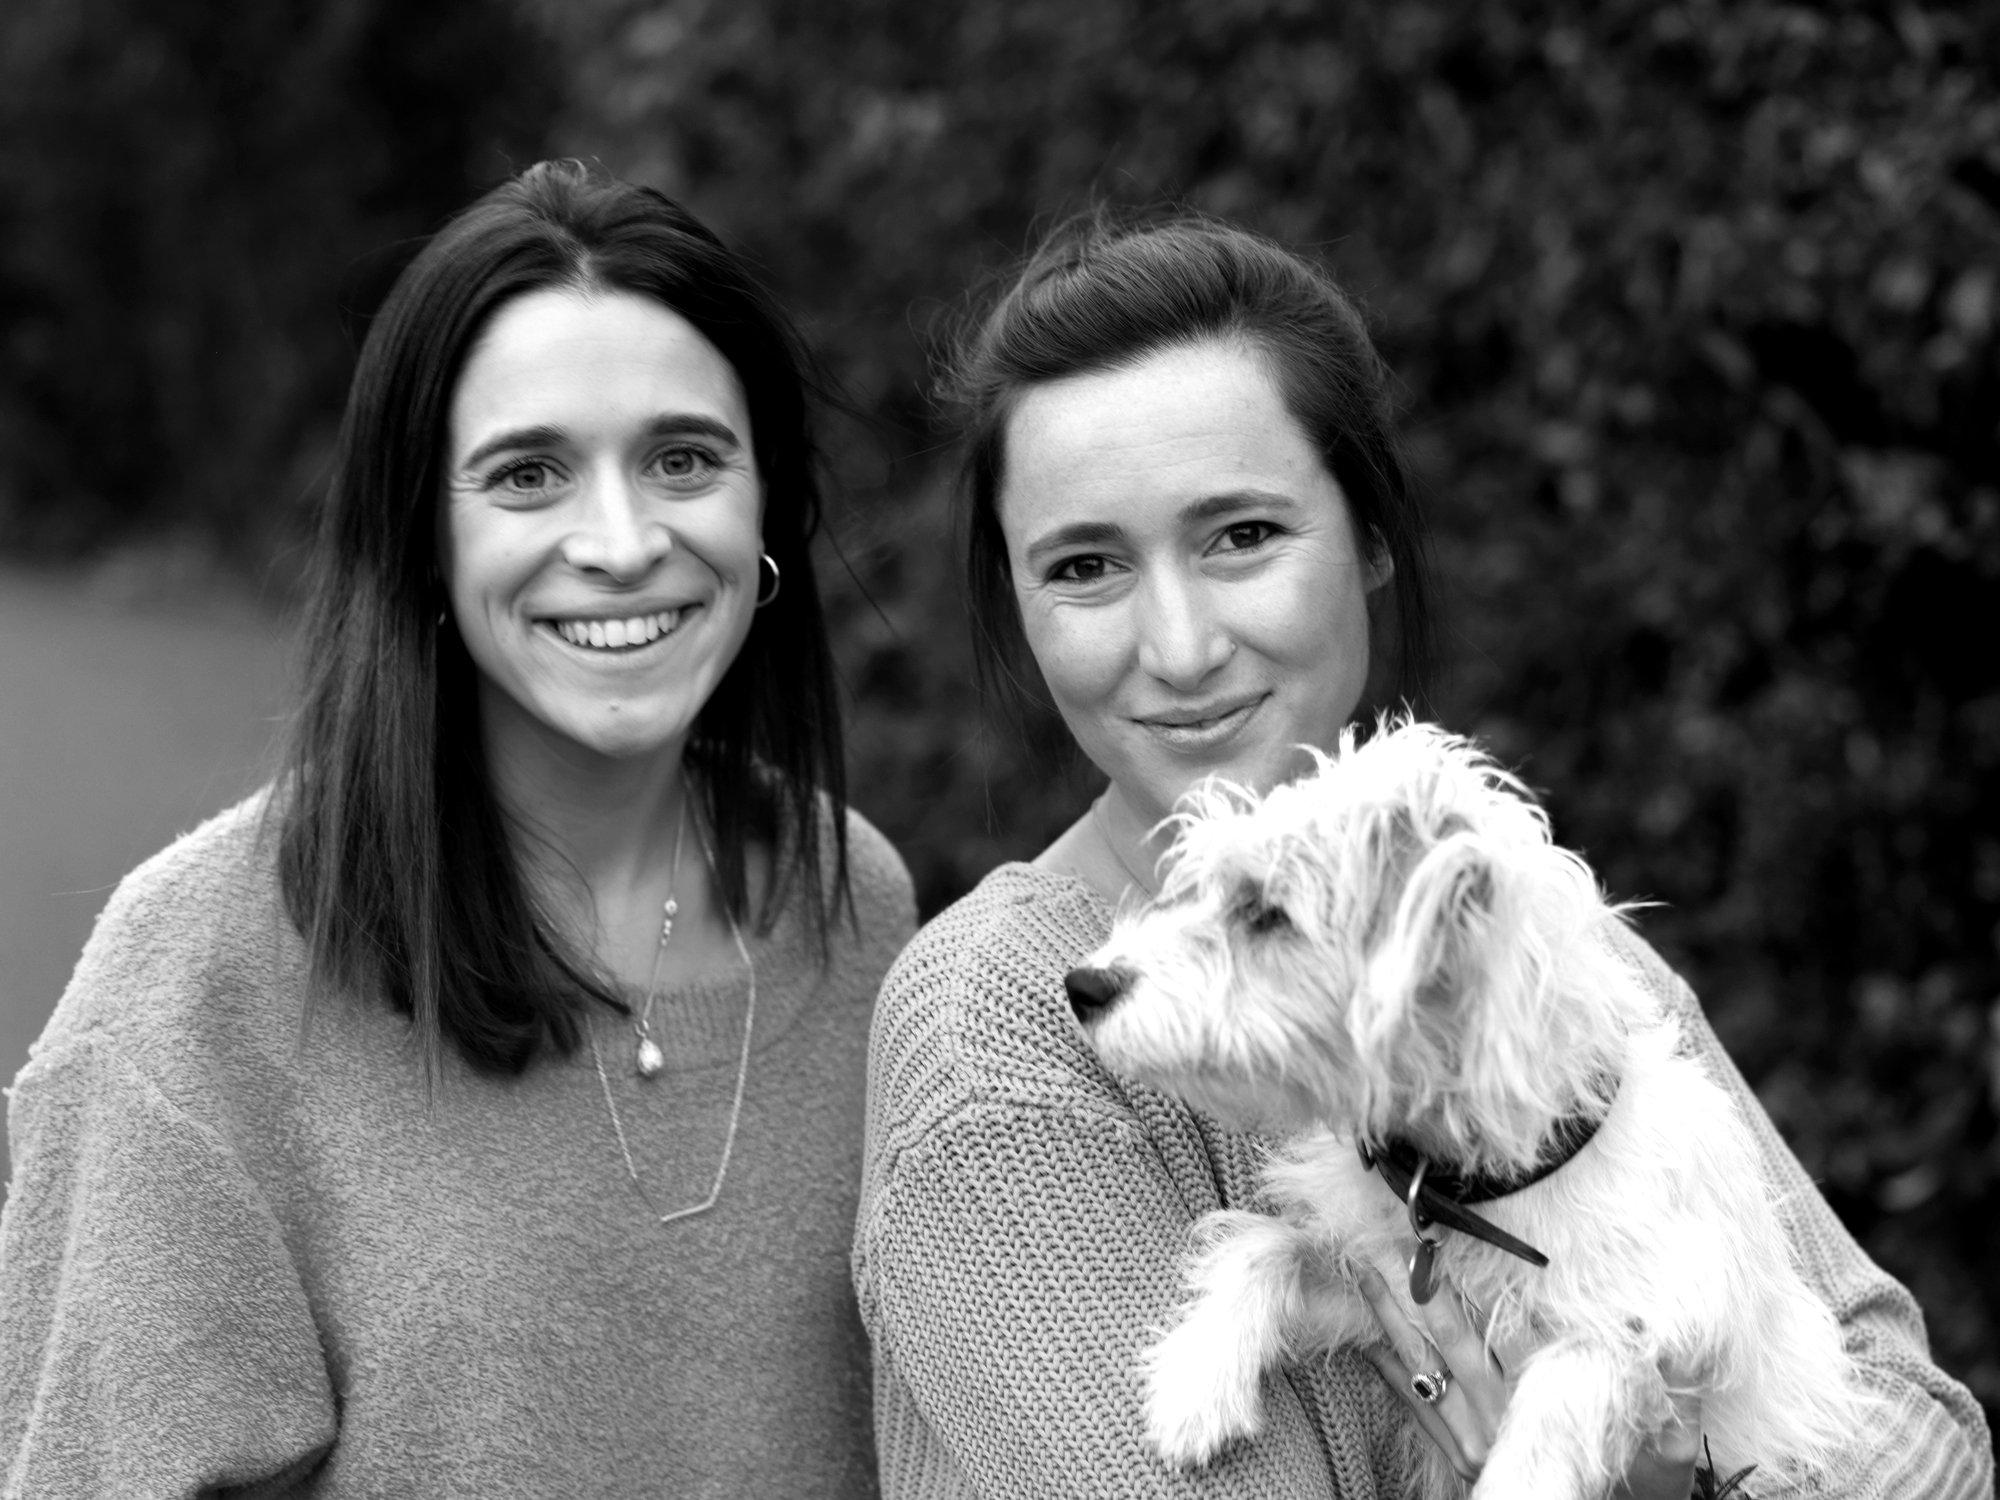 Clara, Rachel and Tonka the dog